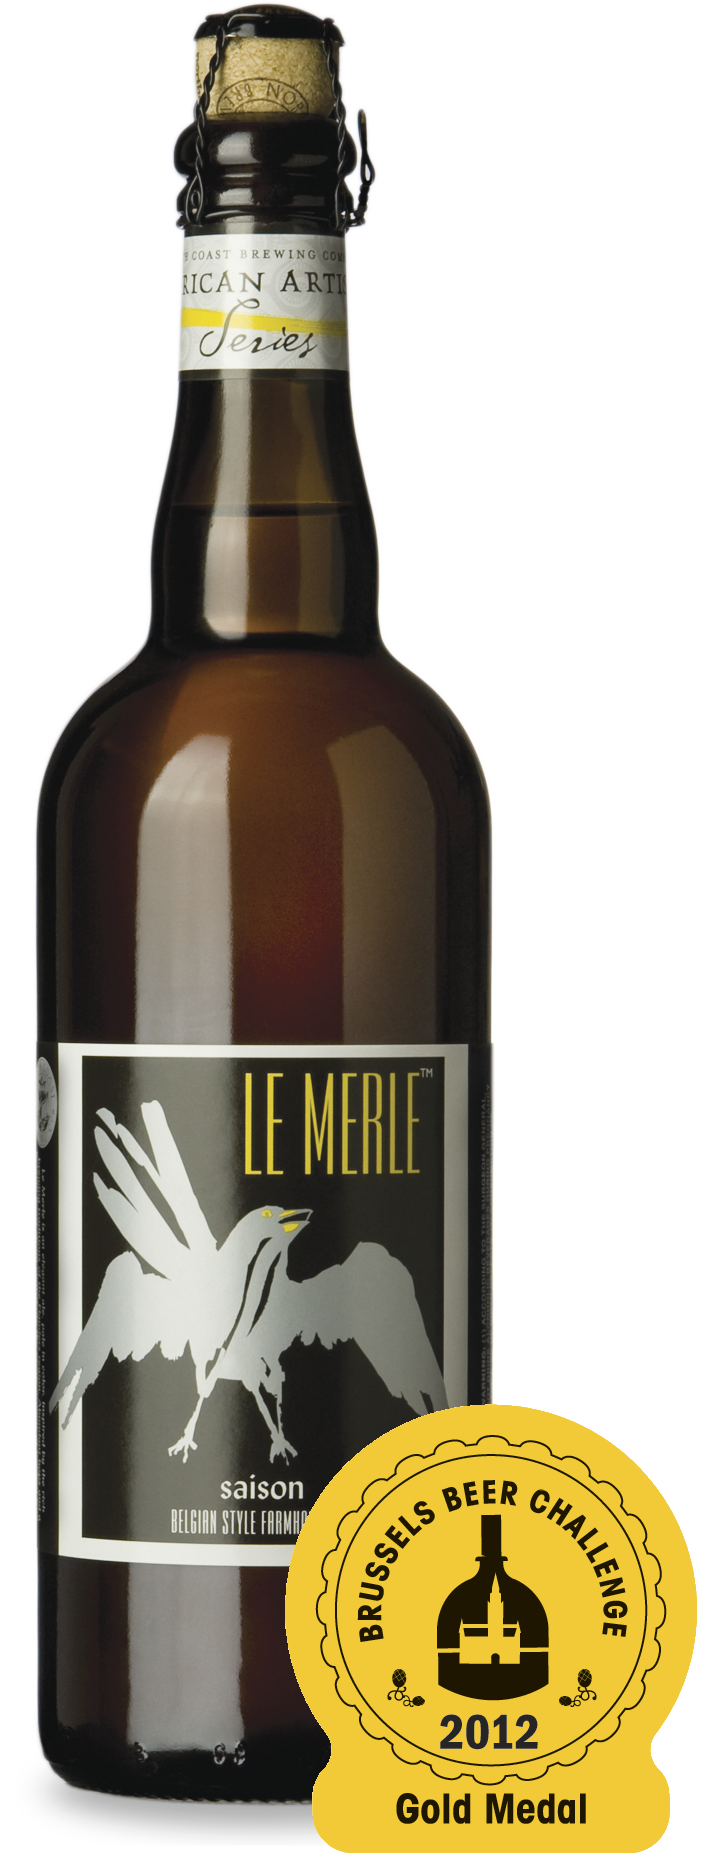 Le Merle - 2012 Gold Medal Winner Brussels Beer Challenge!